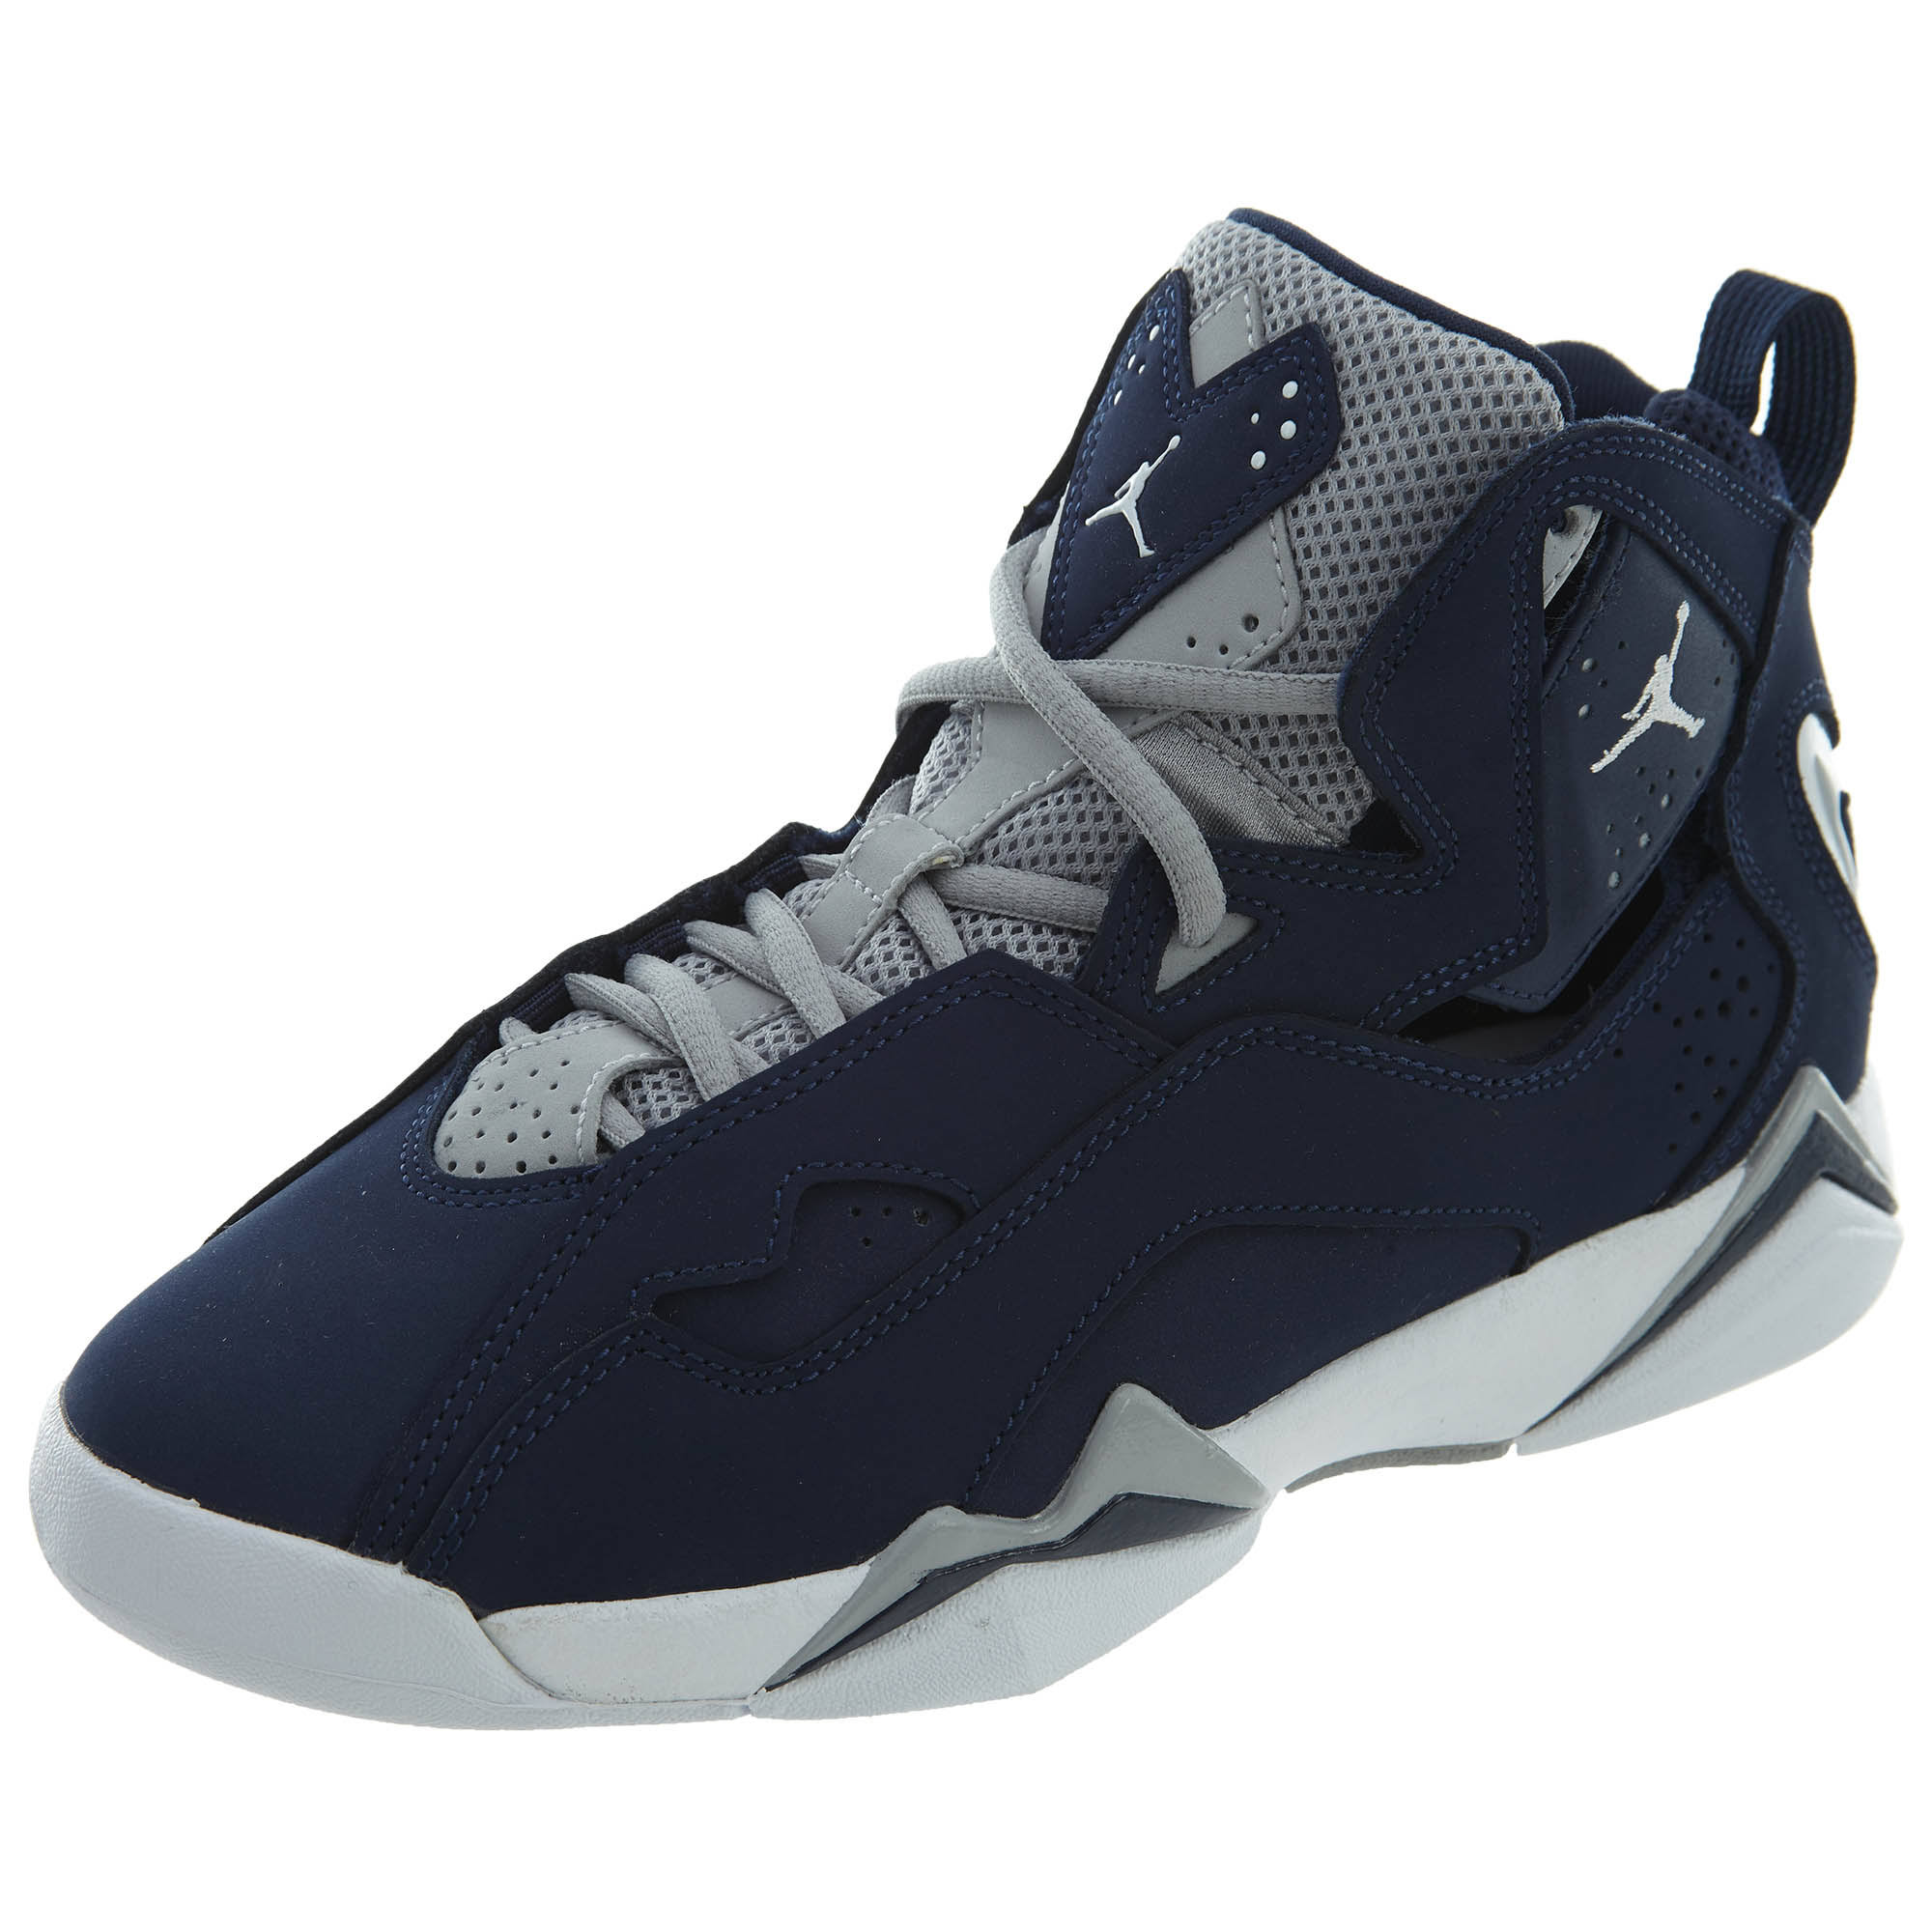 Baloncesto azul Zapatillas True Air Flight 5 Tamaño Jordan De nYxnrR4